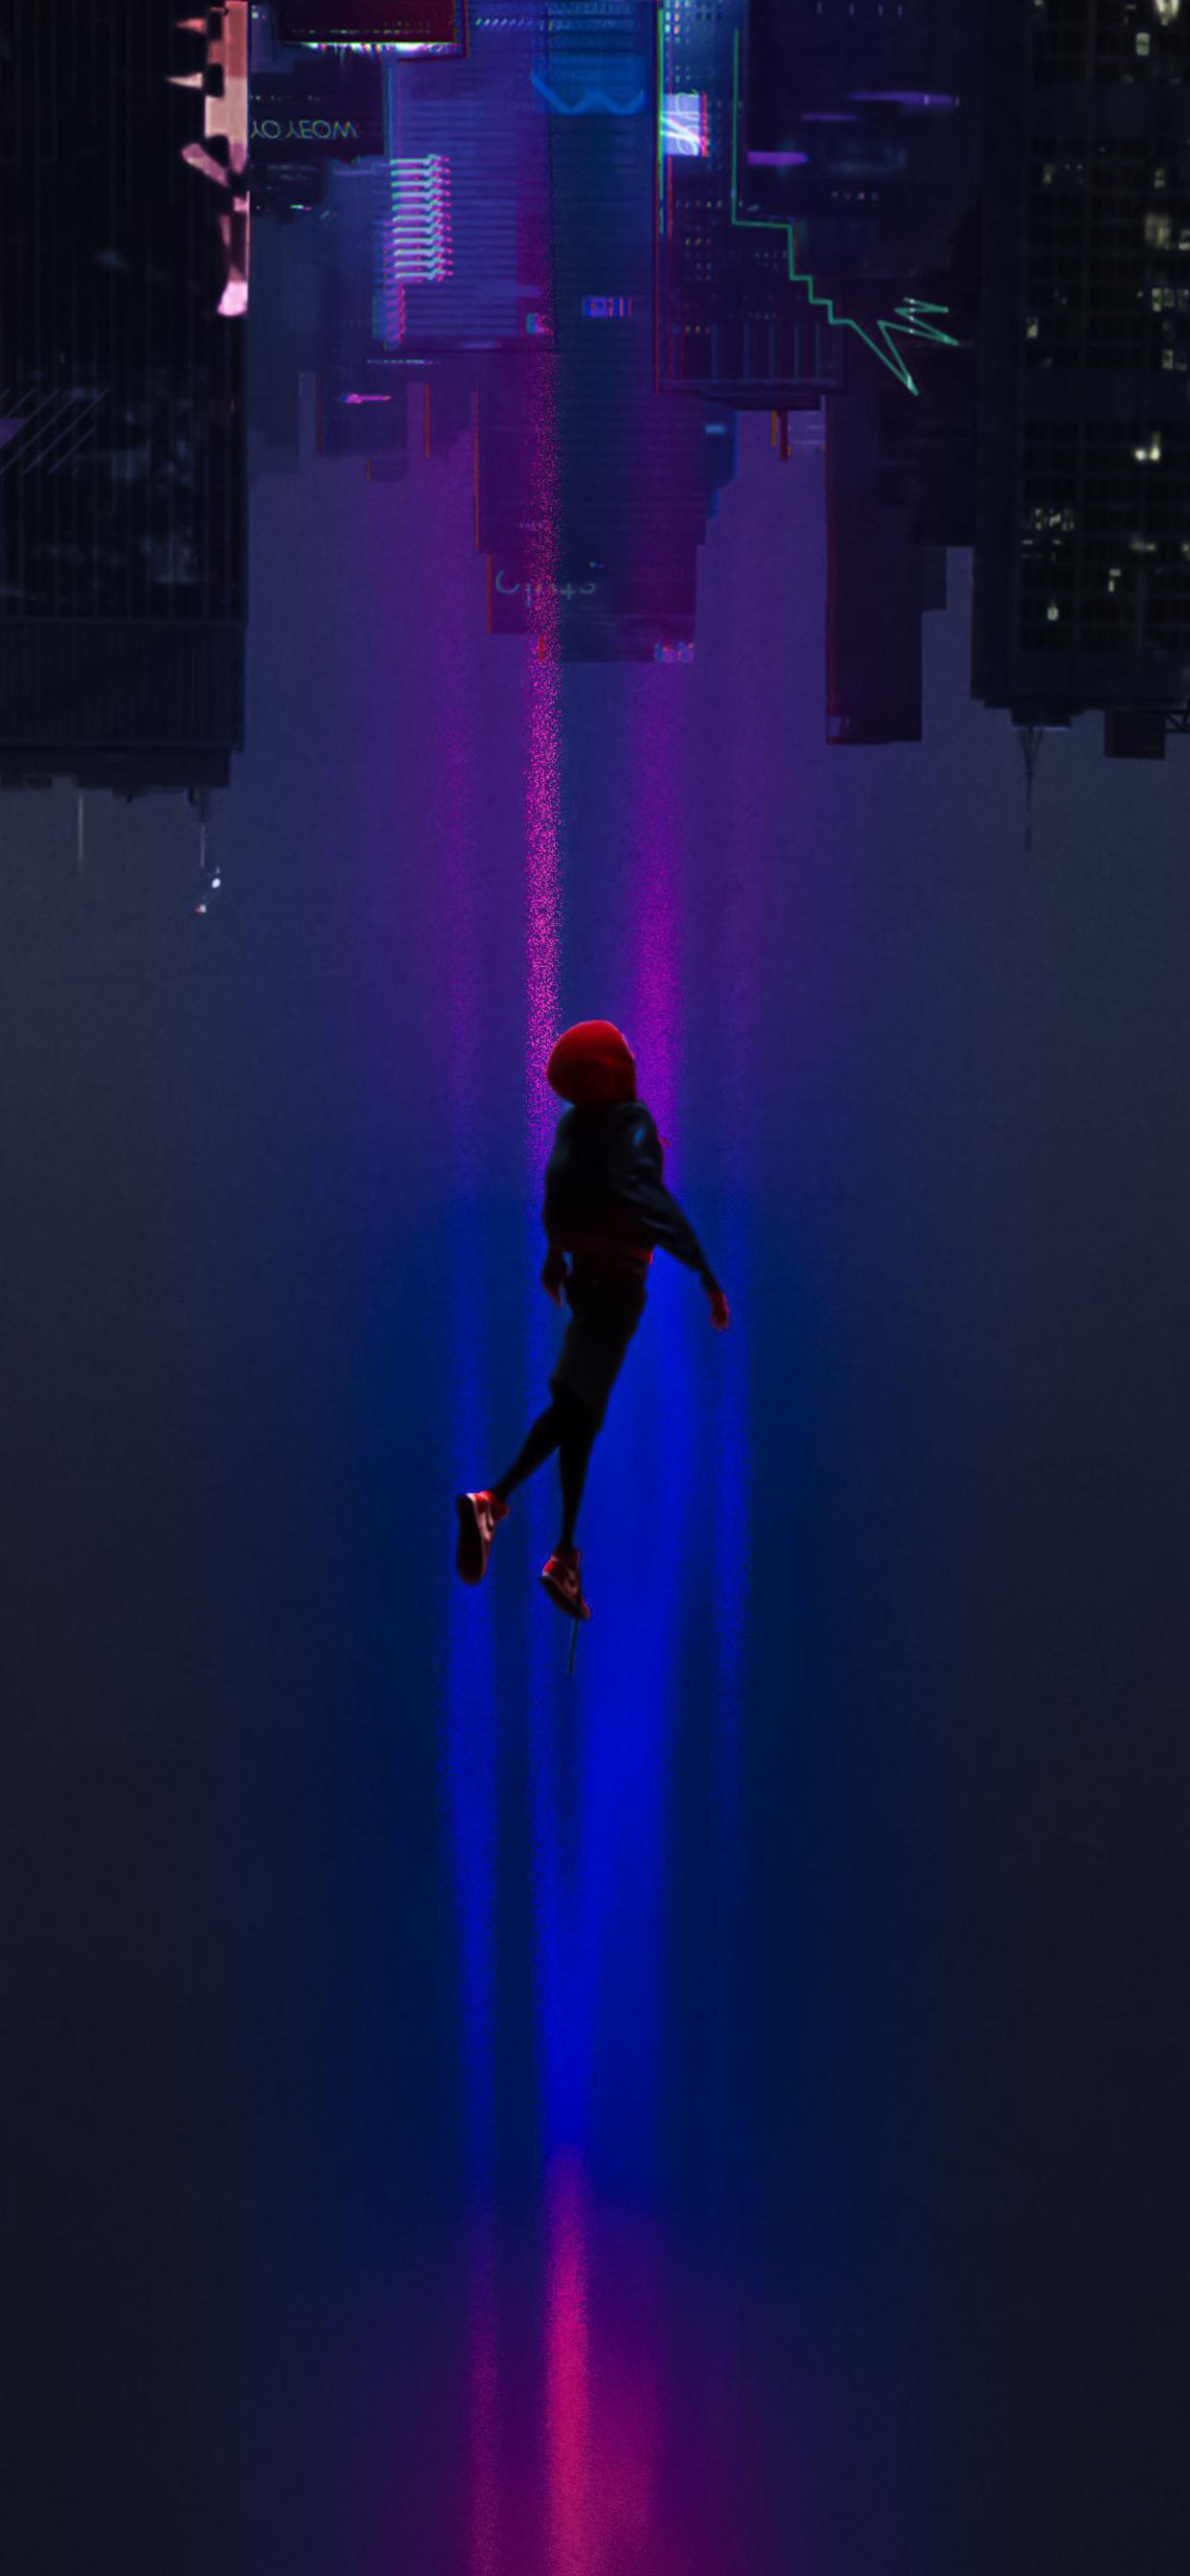 1242x2688 Spiderman Into The Spider Verse Movie 2018 Art Iphone Xs